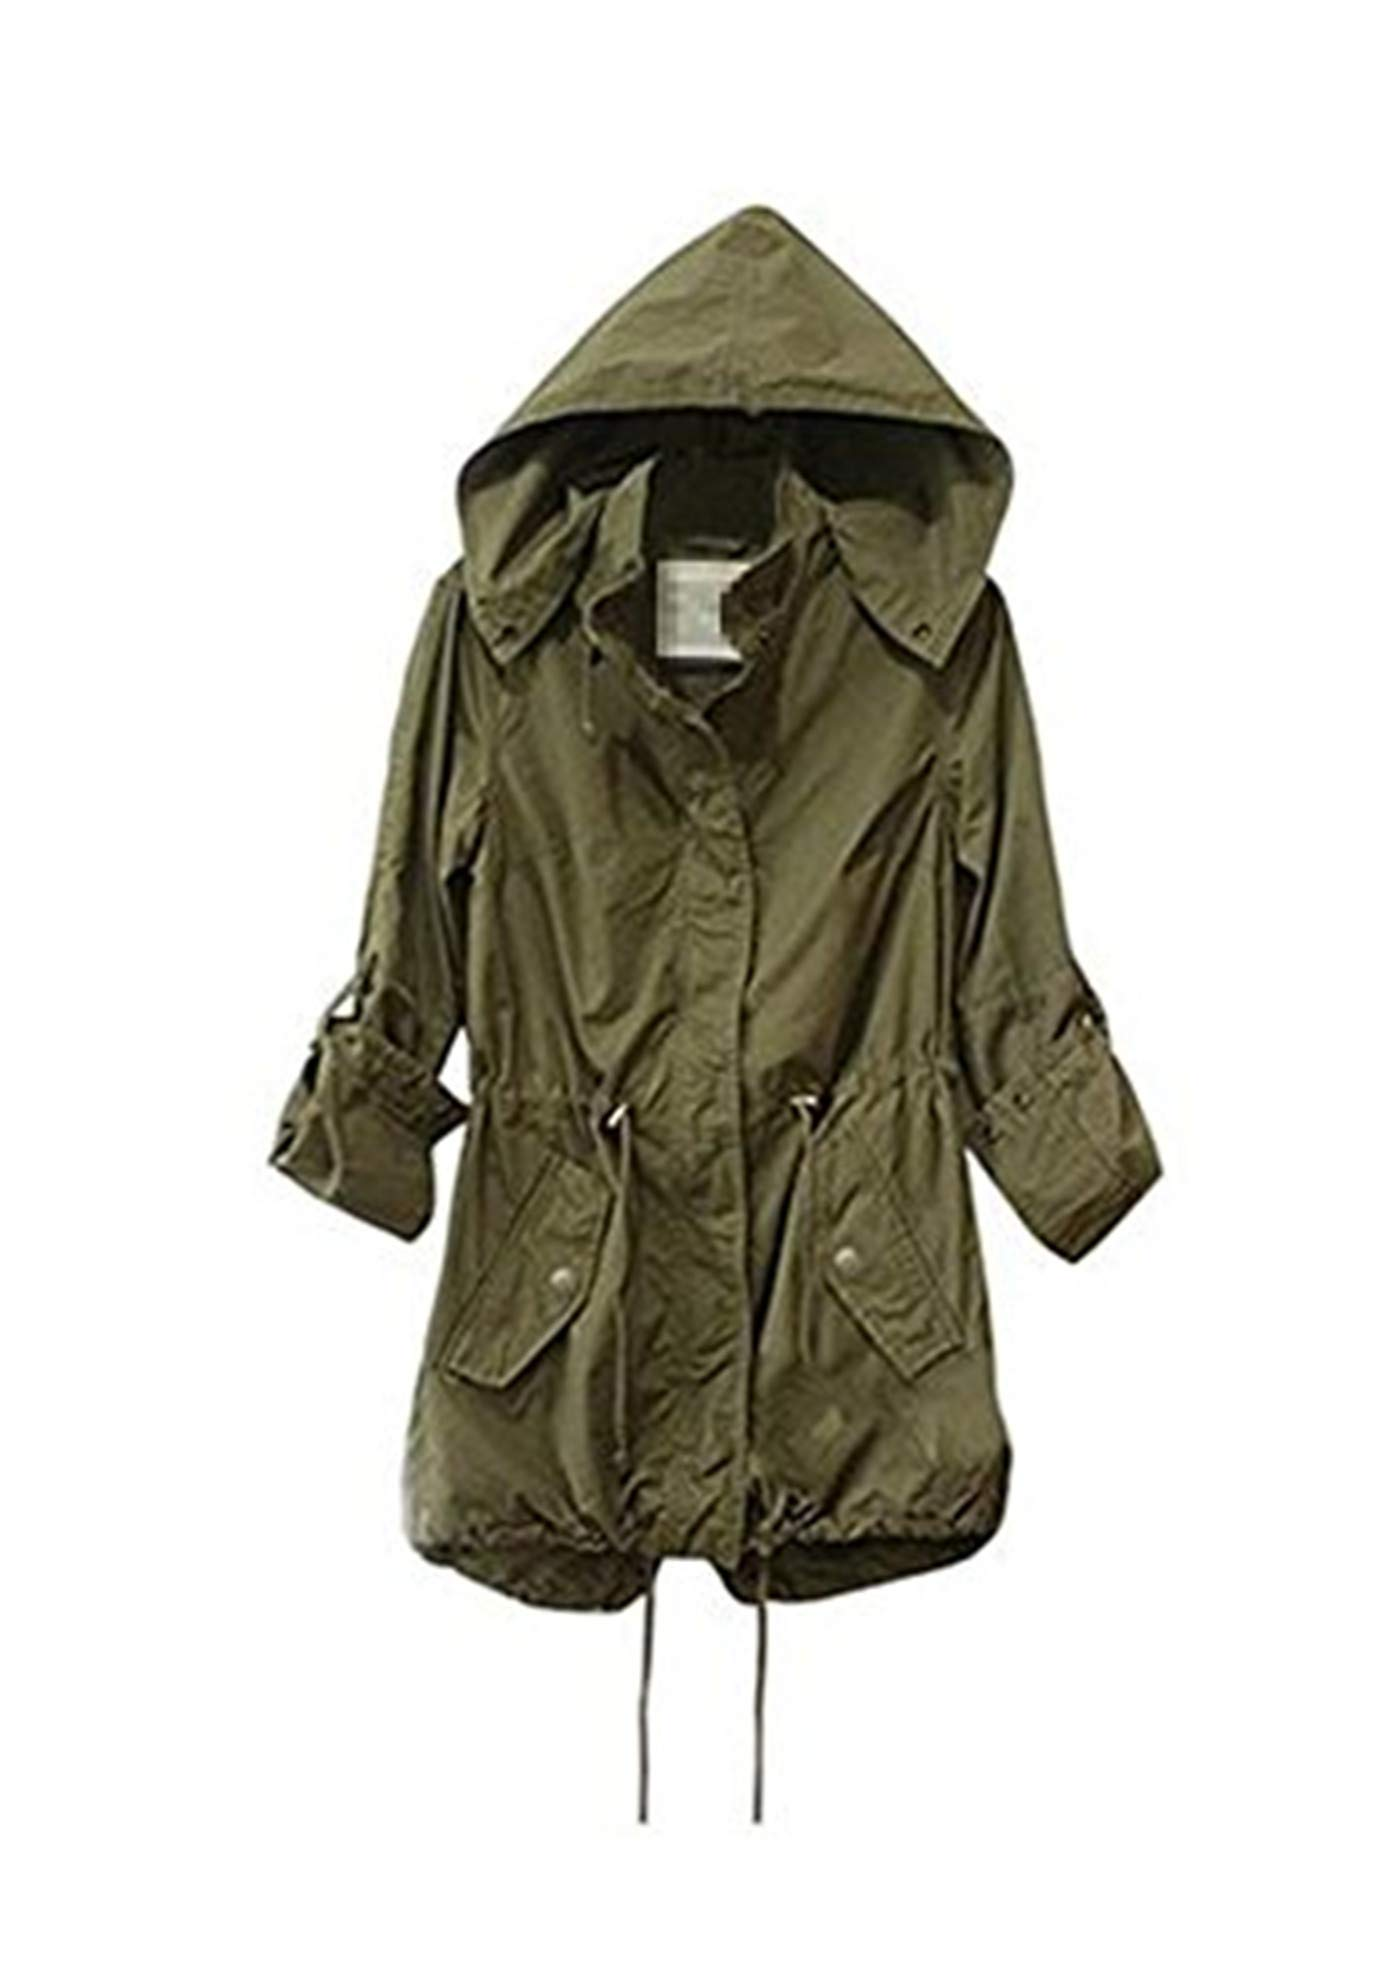 Taiduosheng Women's Army Green Anorak Jacket Lightweight Drawstring Hooded Military Parka Coat S by Taiduosheng